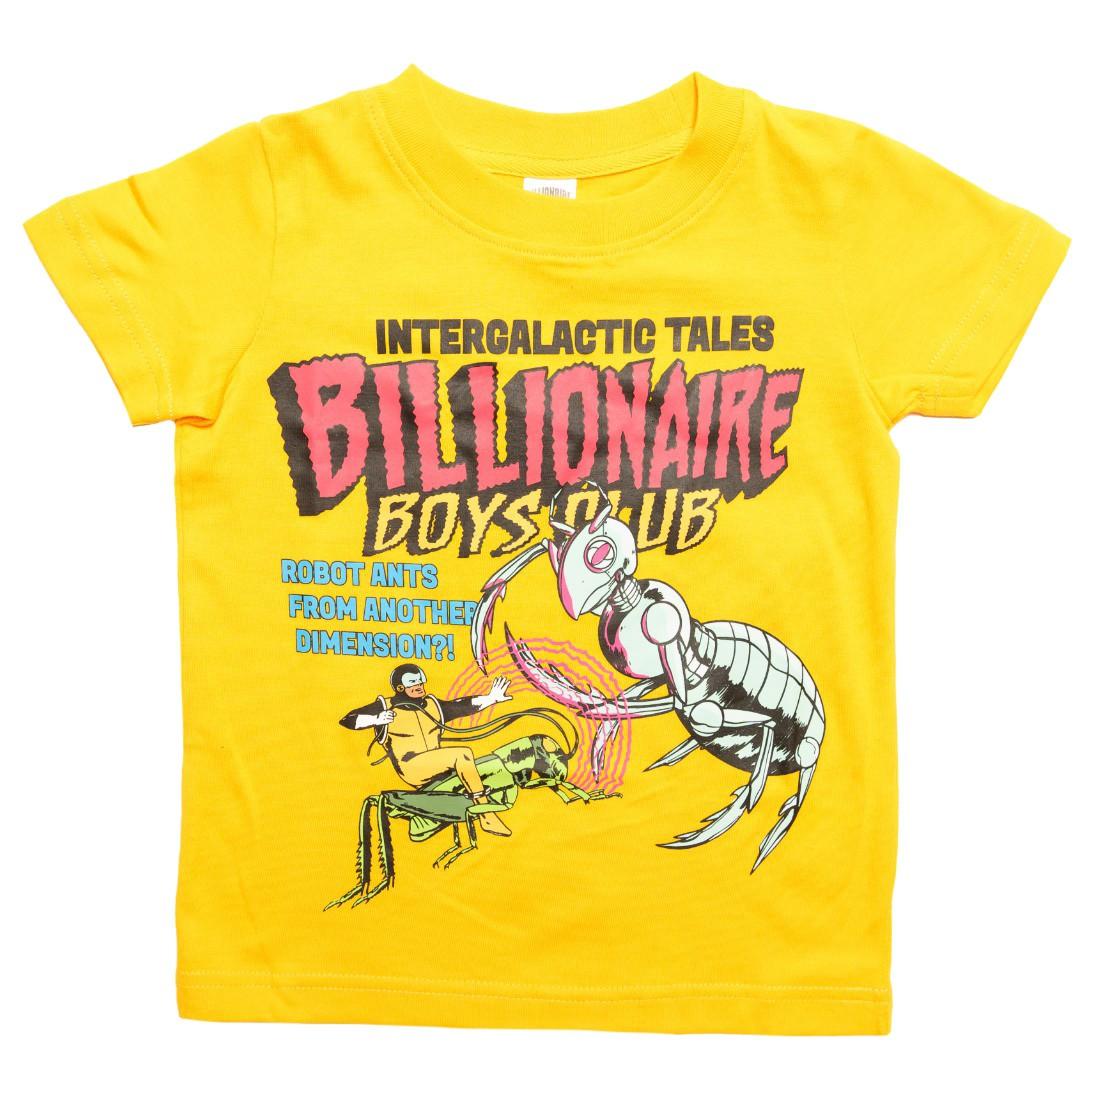 Billionaire Boys Club Little Kids Fly Trap Tee (yellow / citrus)